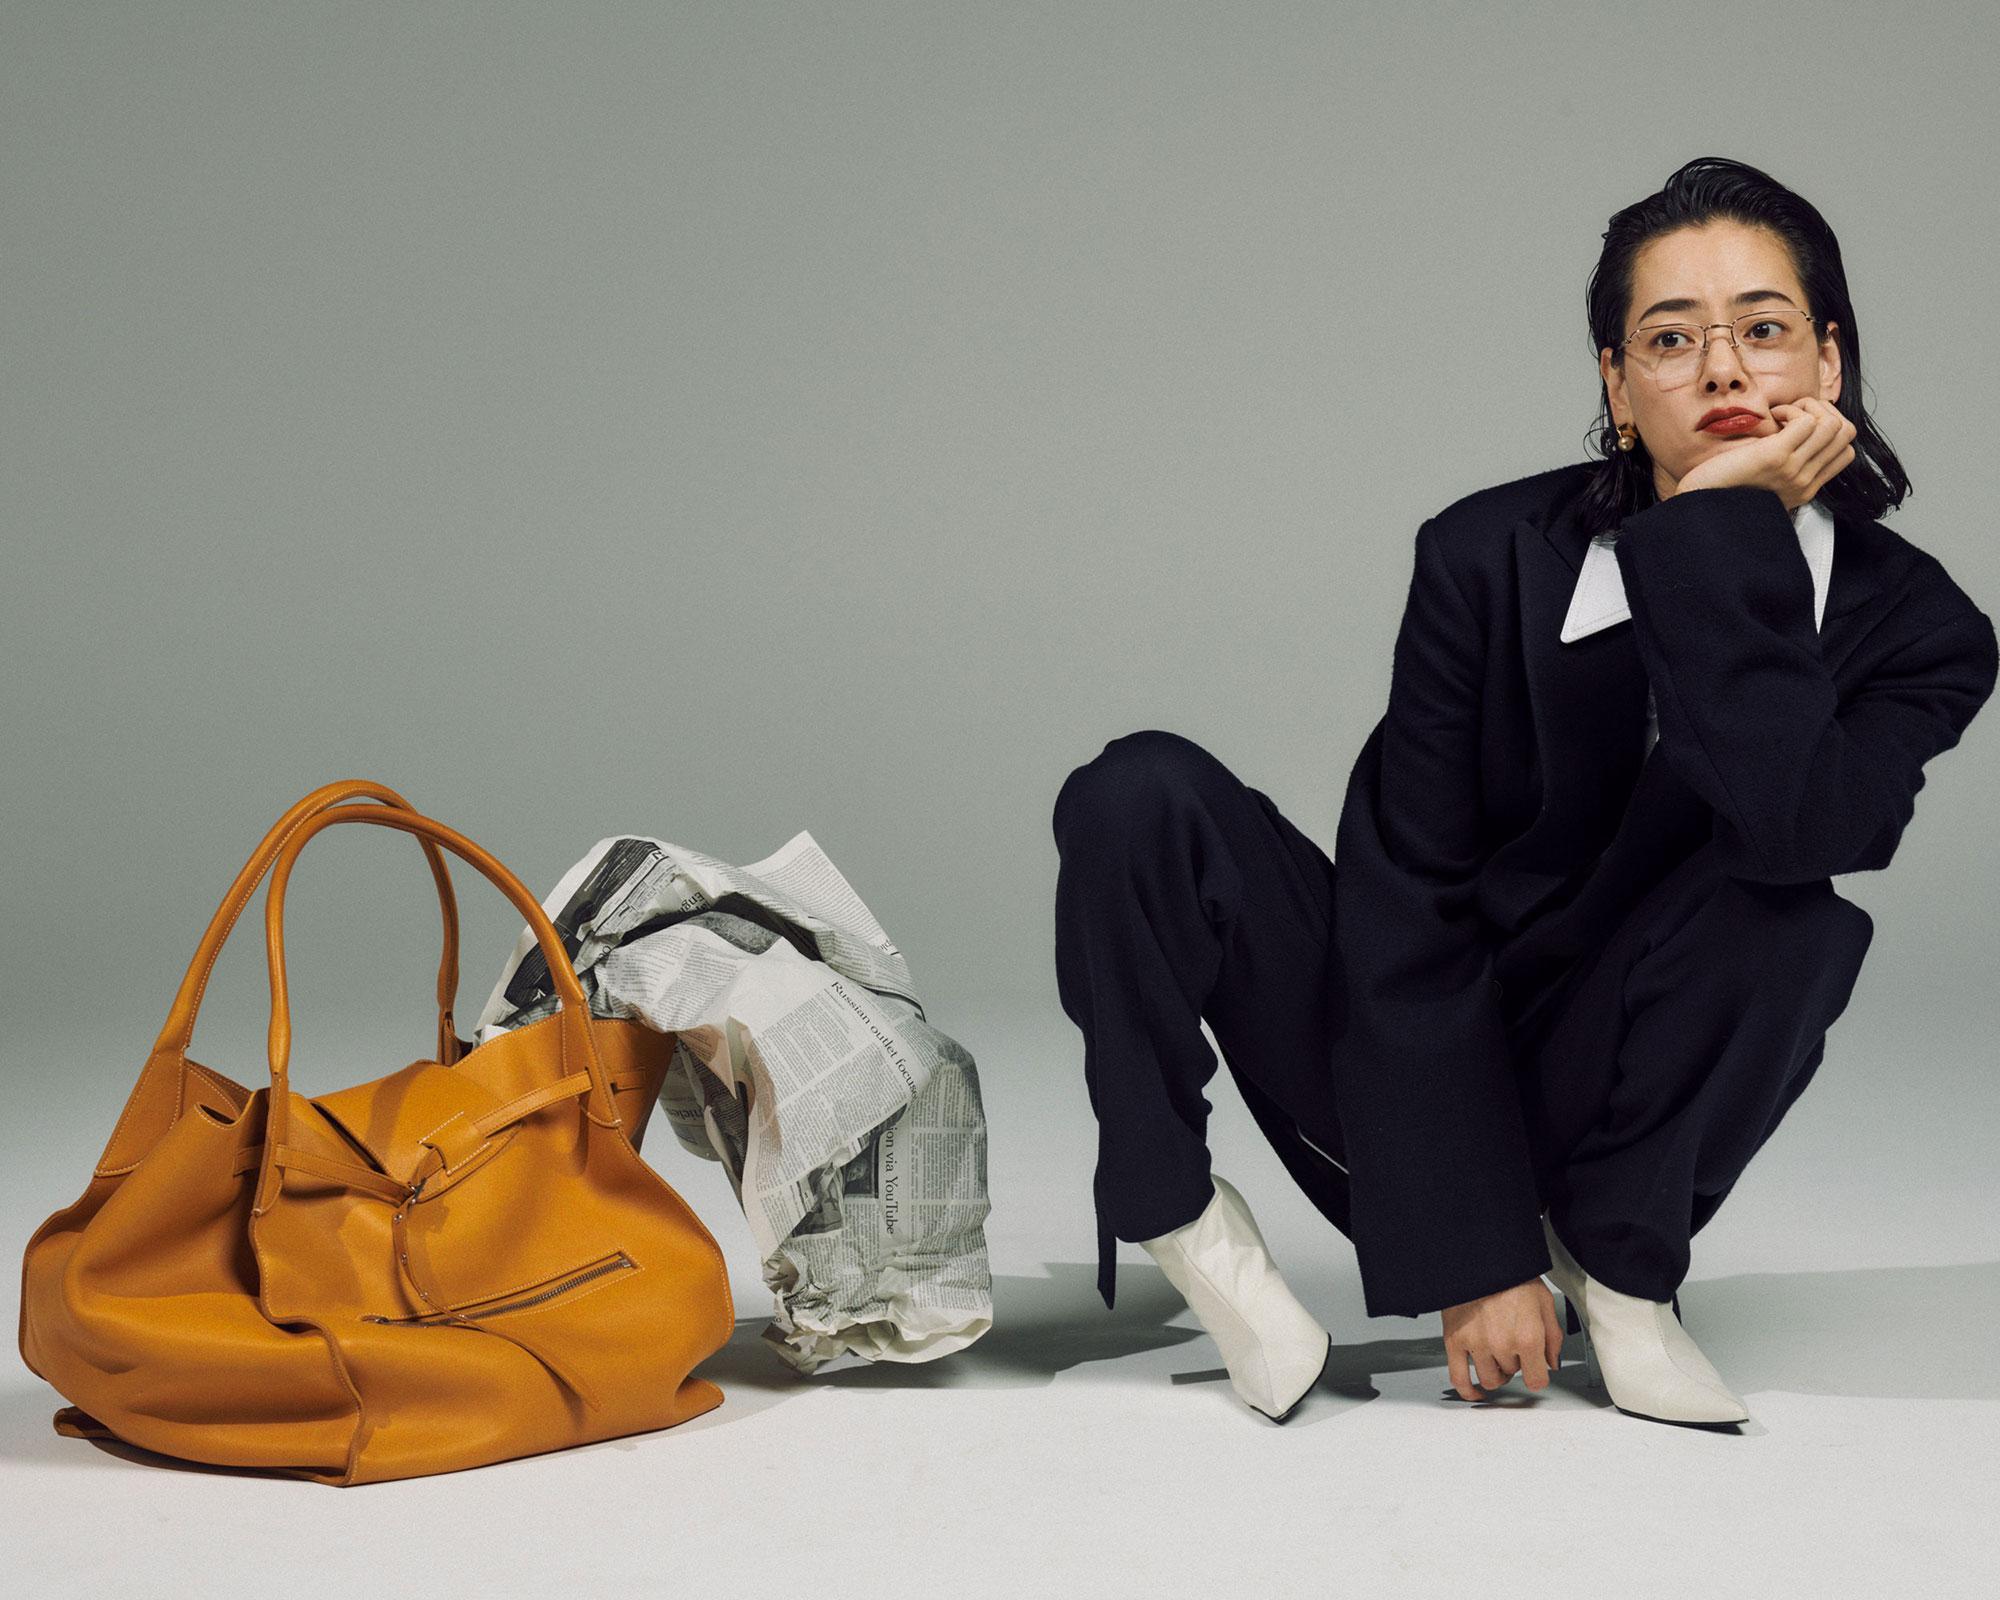 <Creative Staff> Photographer: Mitsuo Okamoto | Stylist: Megumi Yoshida | Hair&Makeup: Hiroko Ishikawa <The Look includes>ジャケット ¥305,000、レザーシャツ ¥345,000、パンツ ¥170,000、ブーツ ¥105,000、ピアス ¥65,000、バッグ ¥670,000、全てCéline(セリーヌ) メガネ ¥53,000 ブリンク外苑前